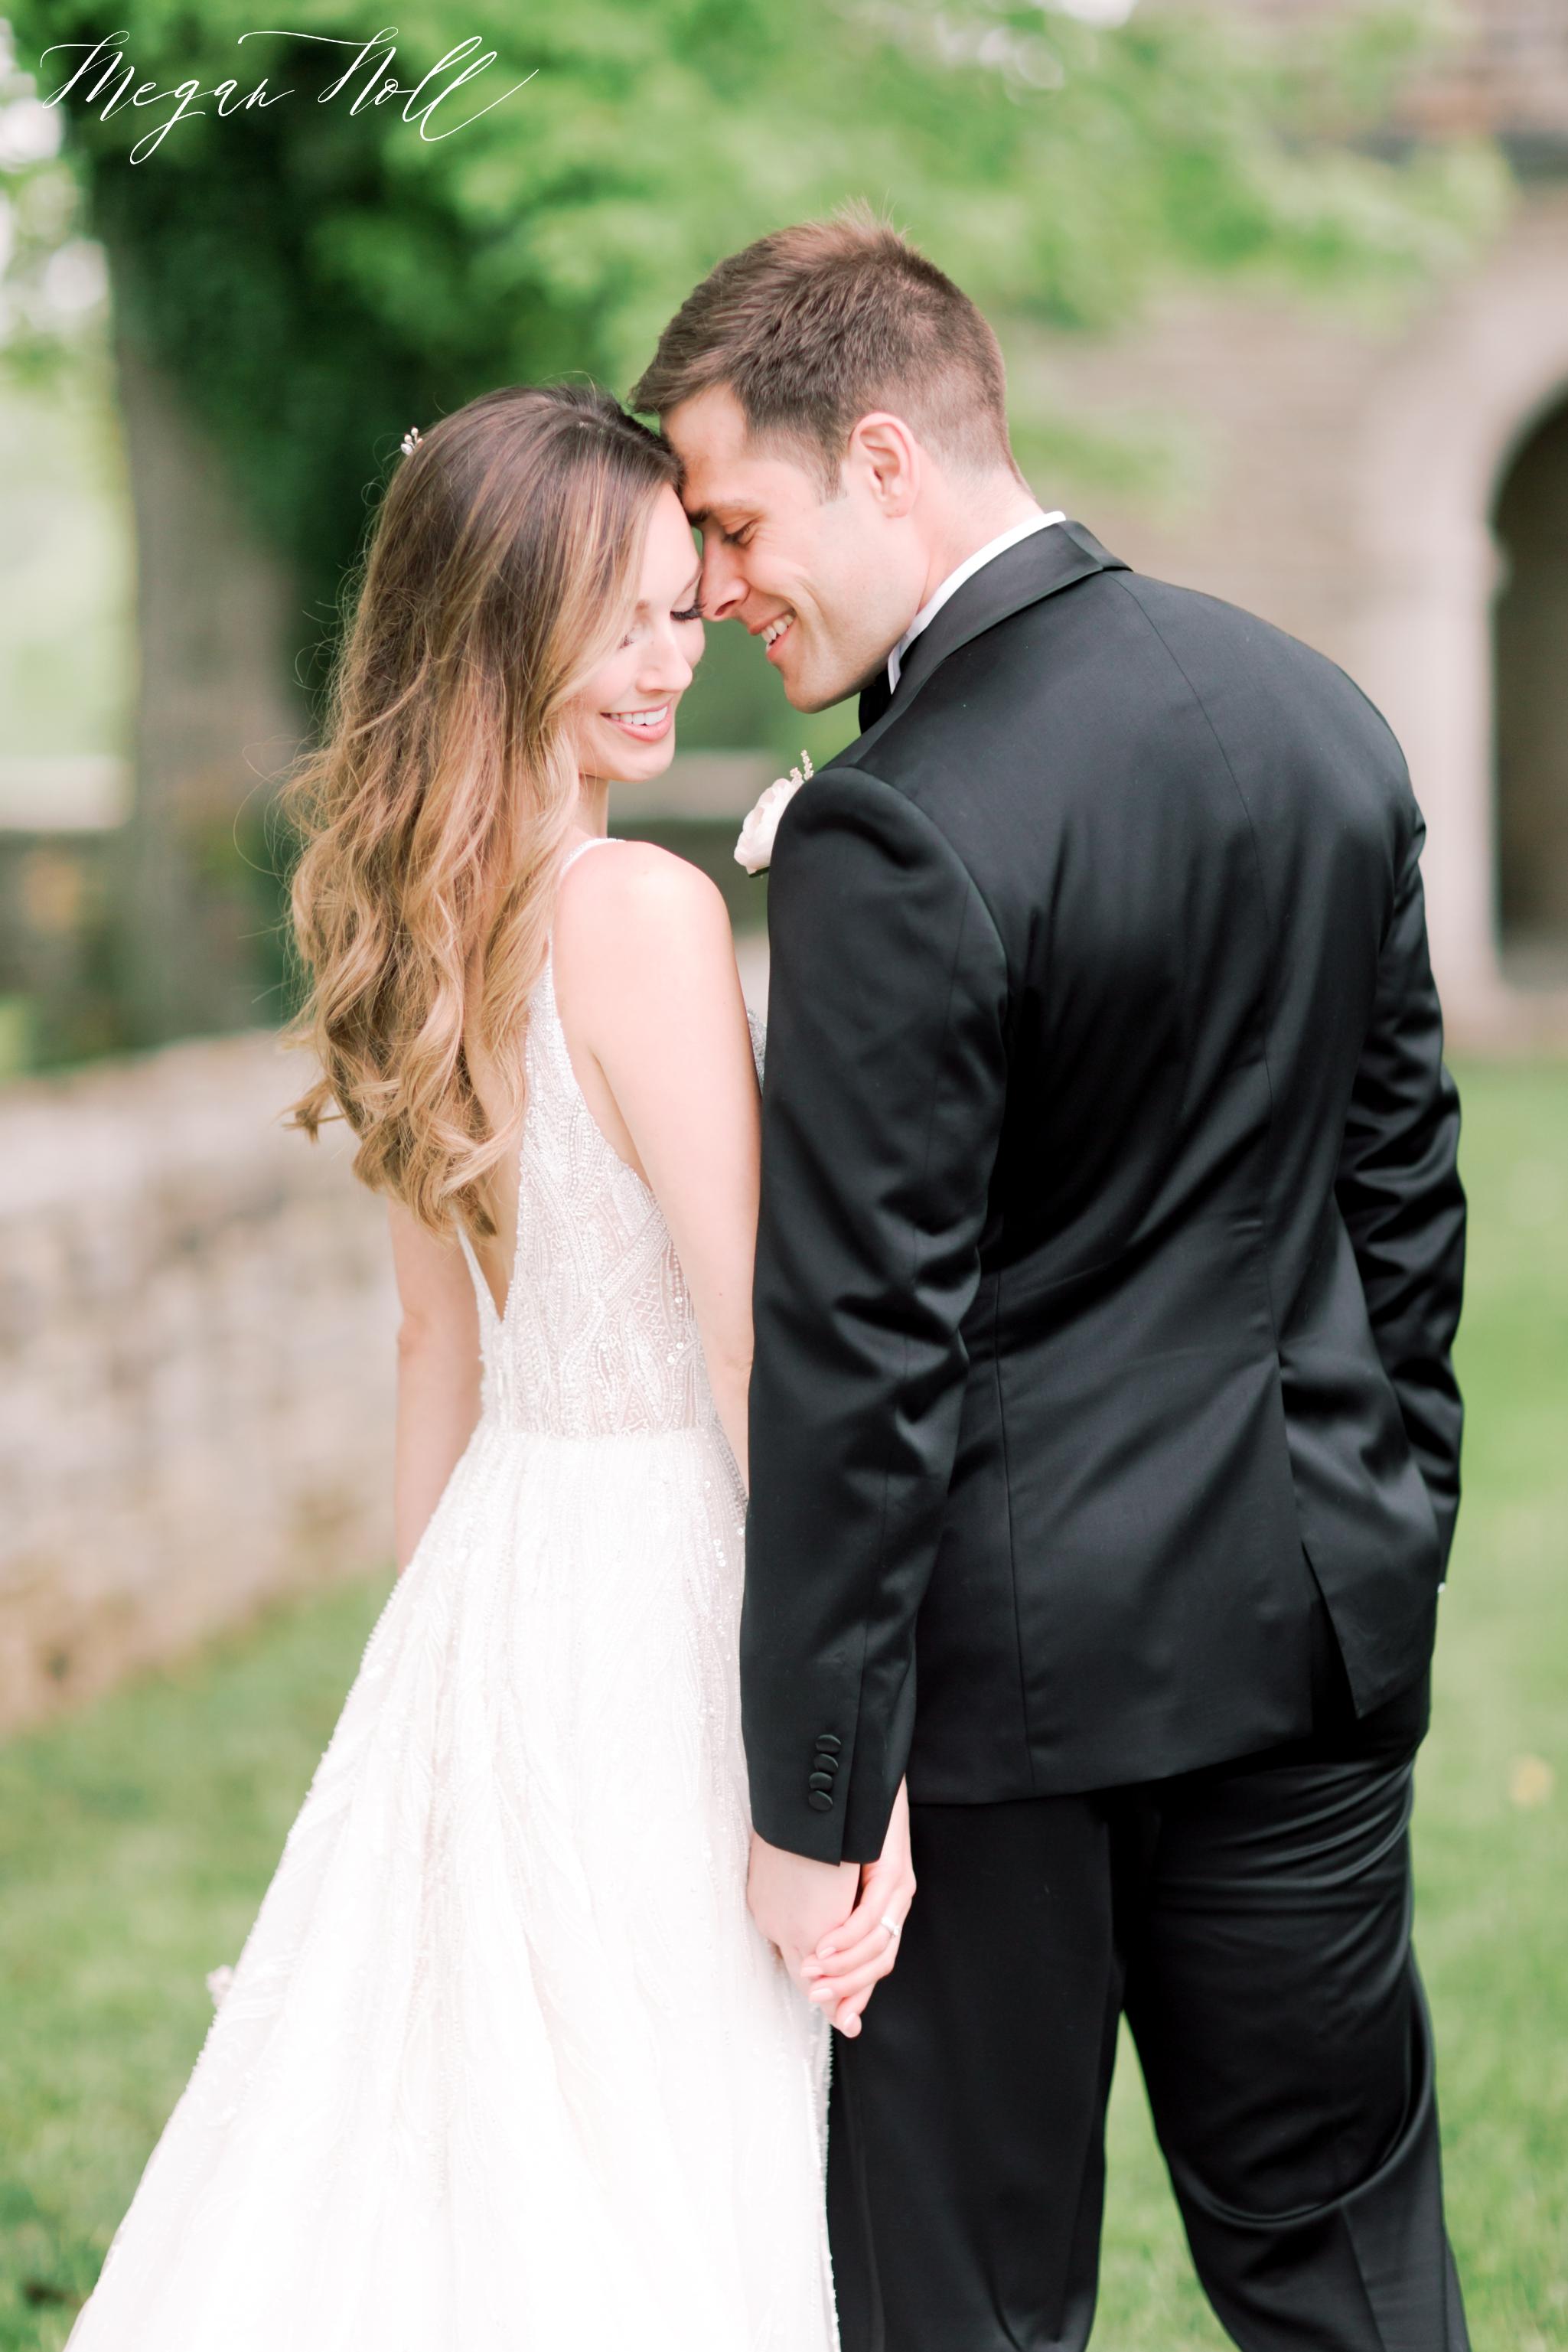 Romantic bride and groom portraits in Cincinnati